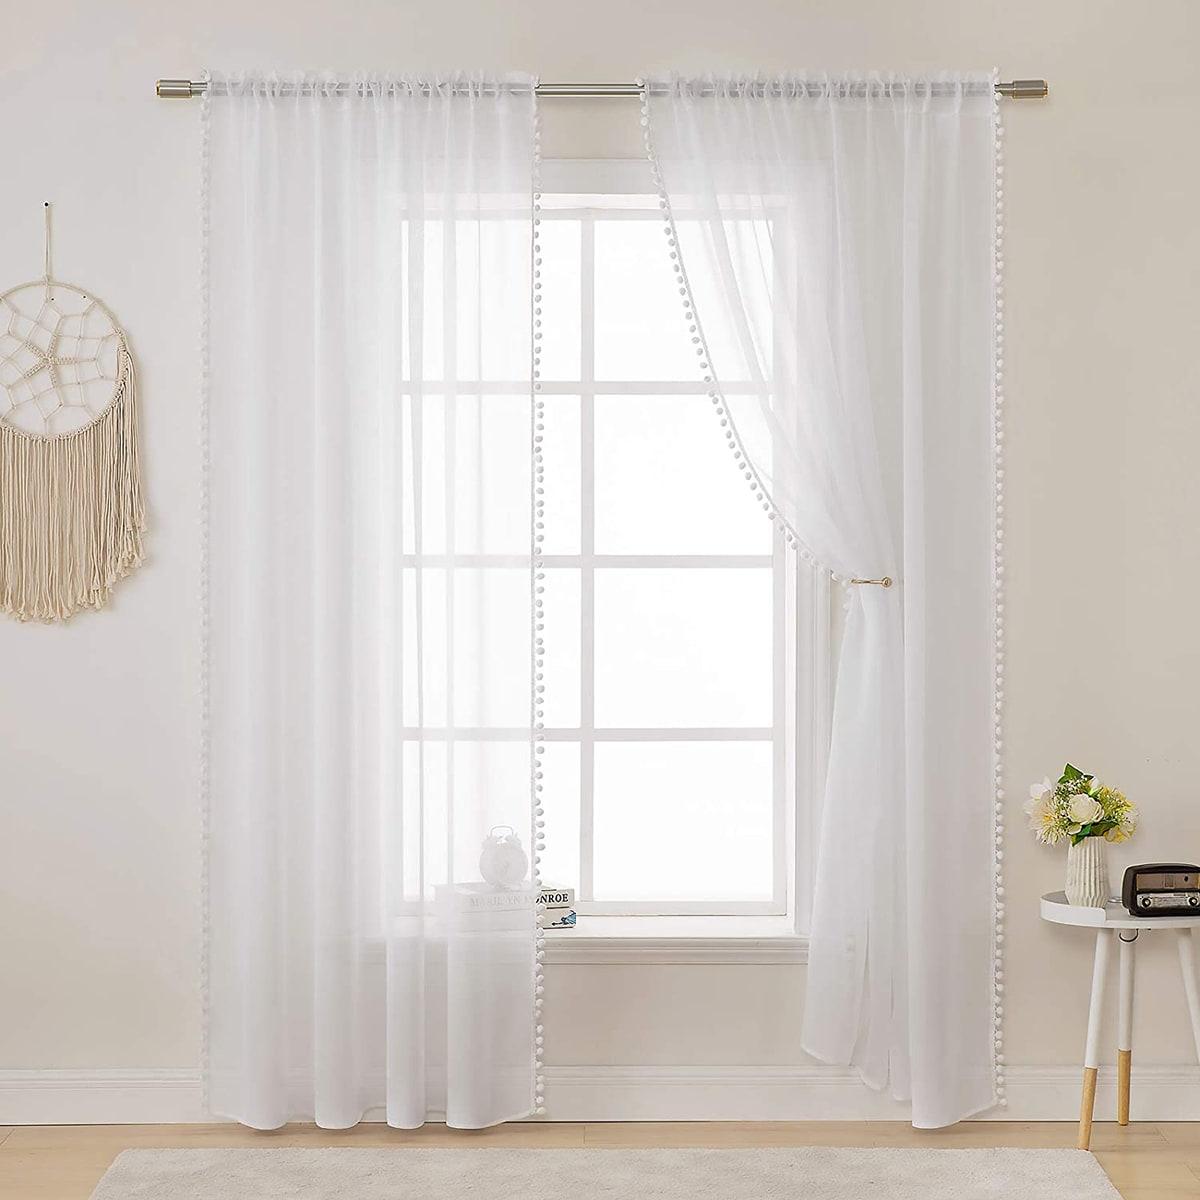 1 Schal Vorhang mit Pompon Dekor